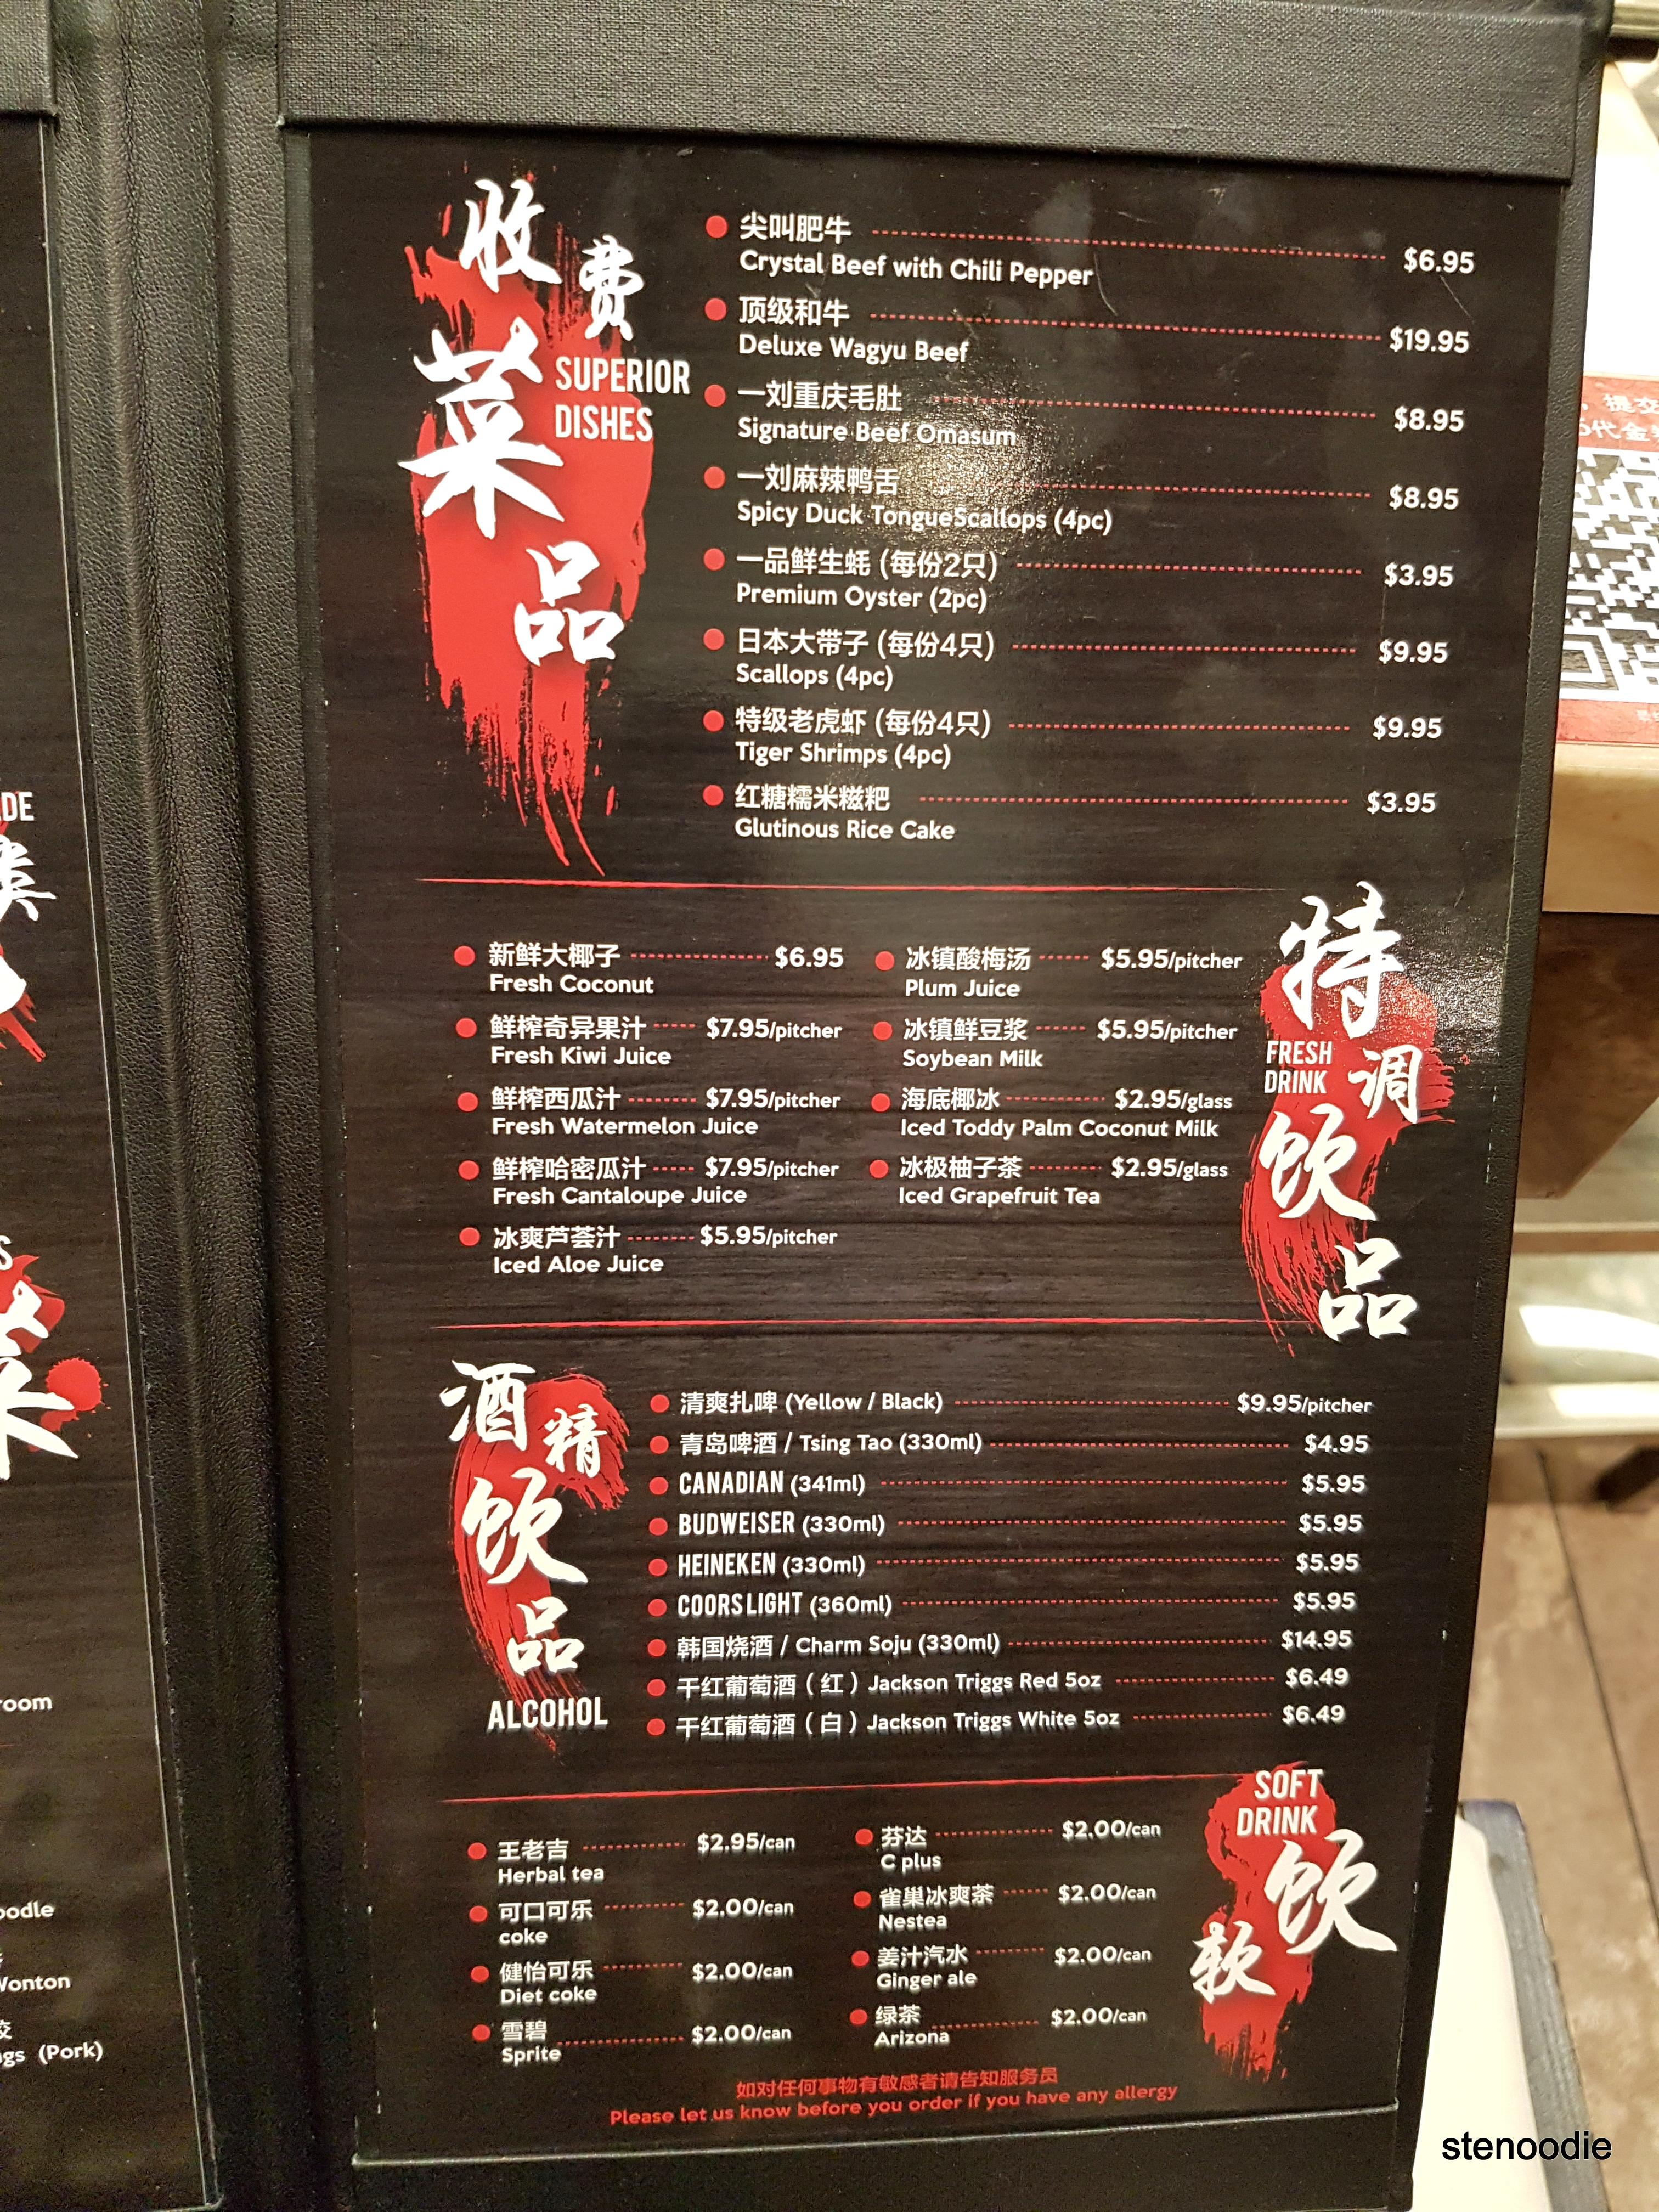 Chongqing Liuyishou Hotpot menu and prices